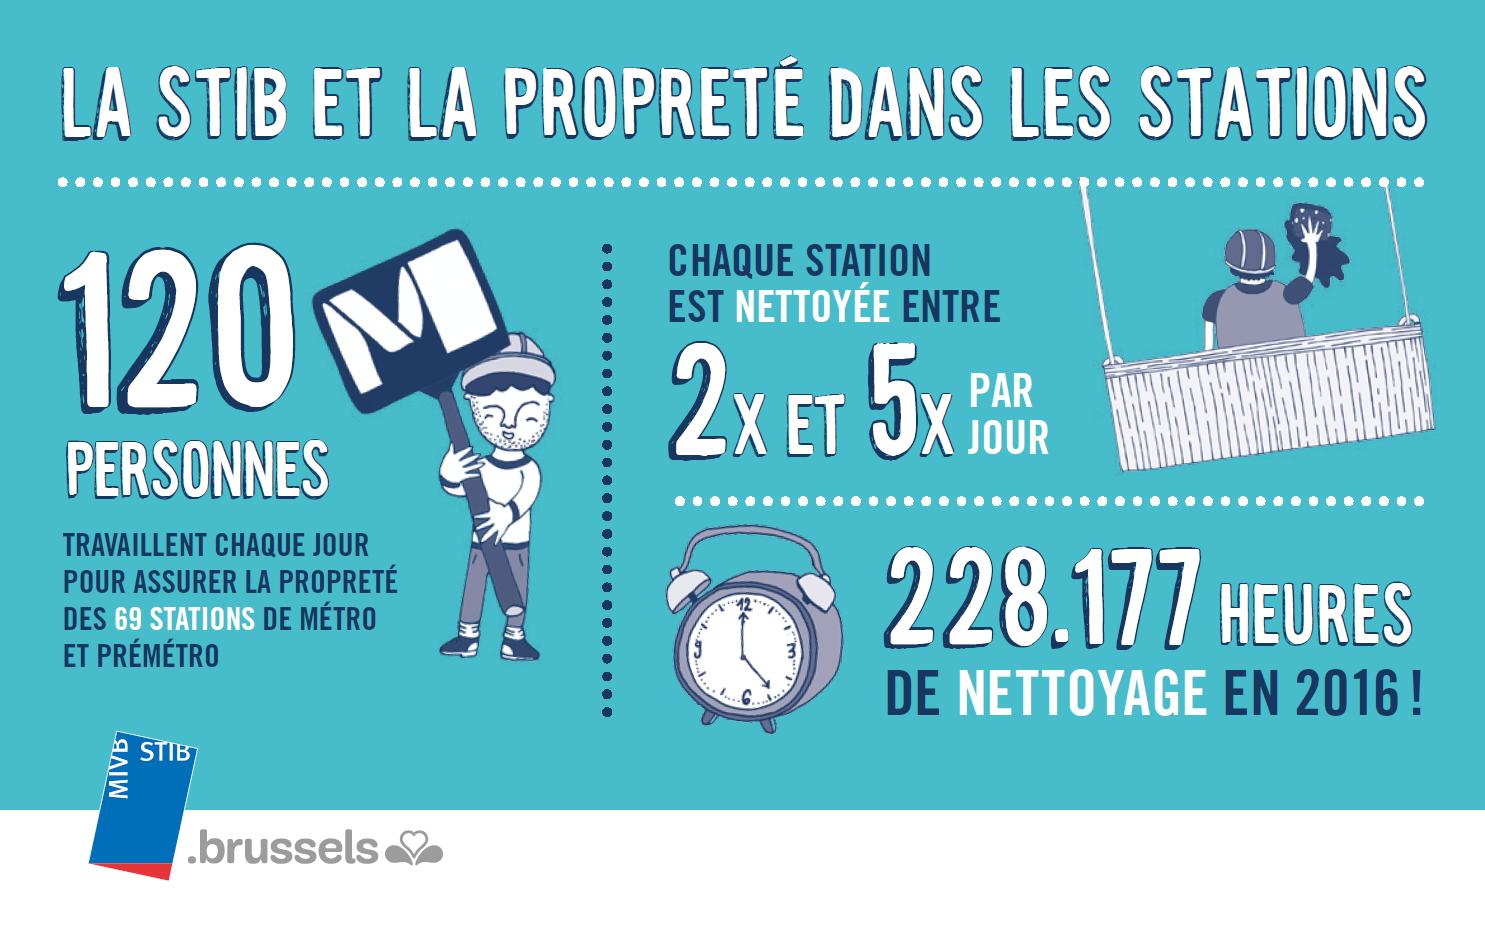 infographie proprete STIB 2016